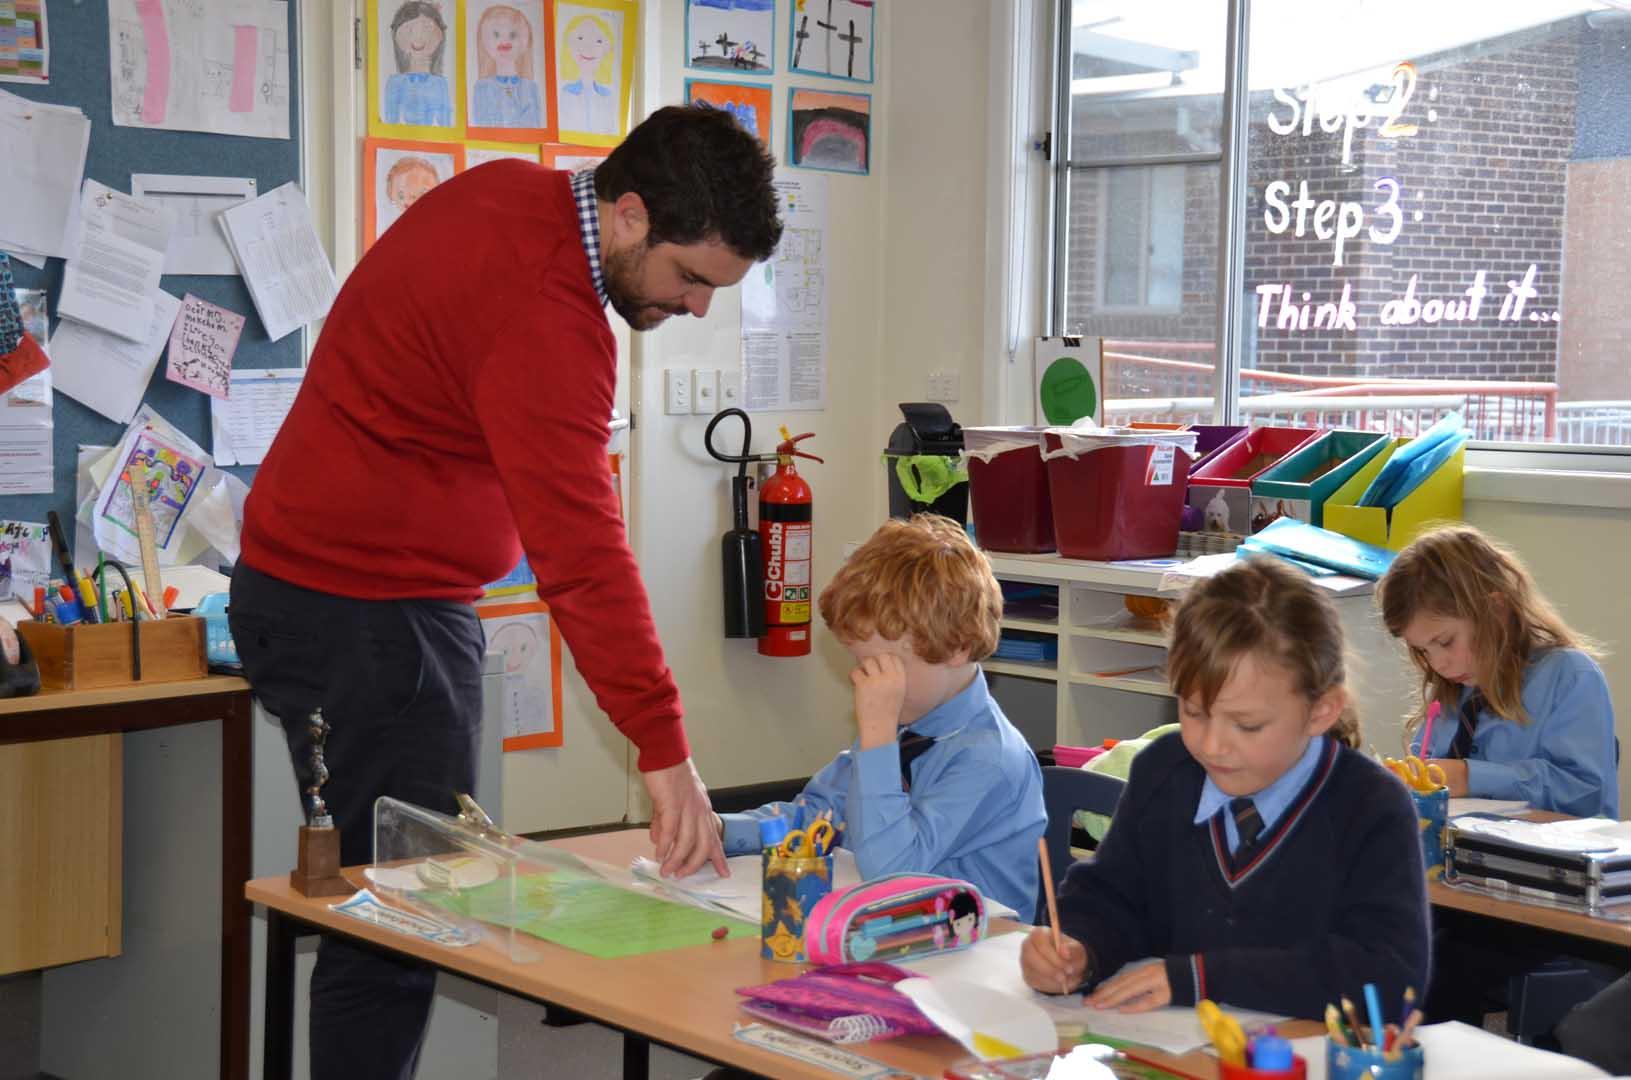 St-Patricks-walcha-classroom5745